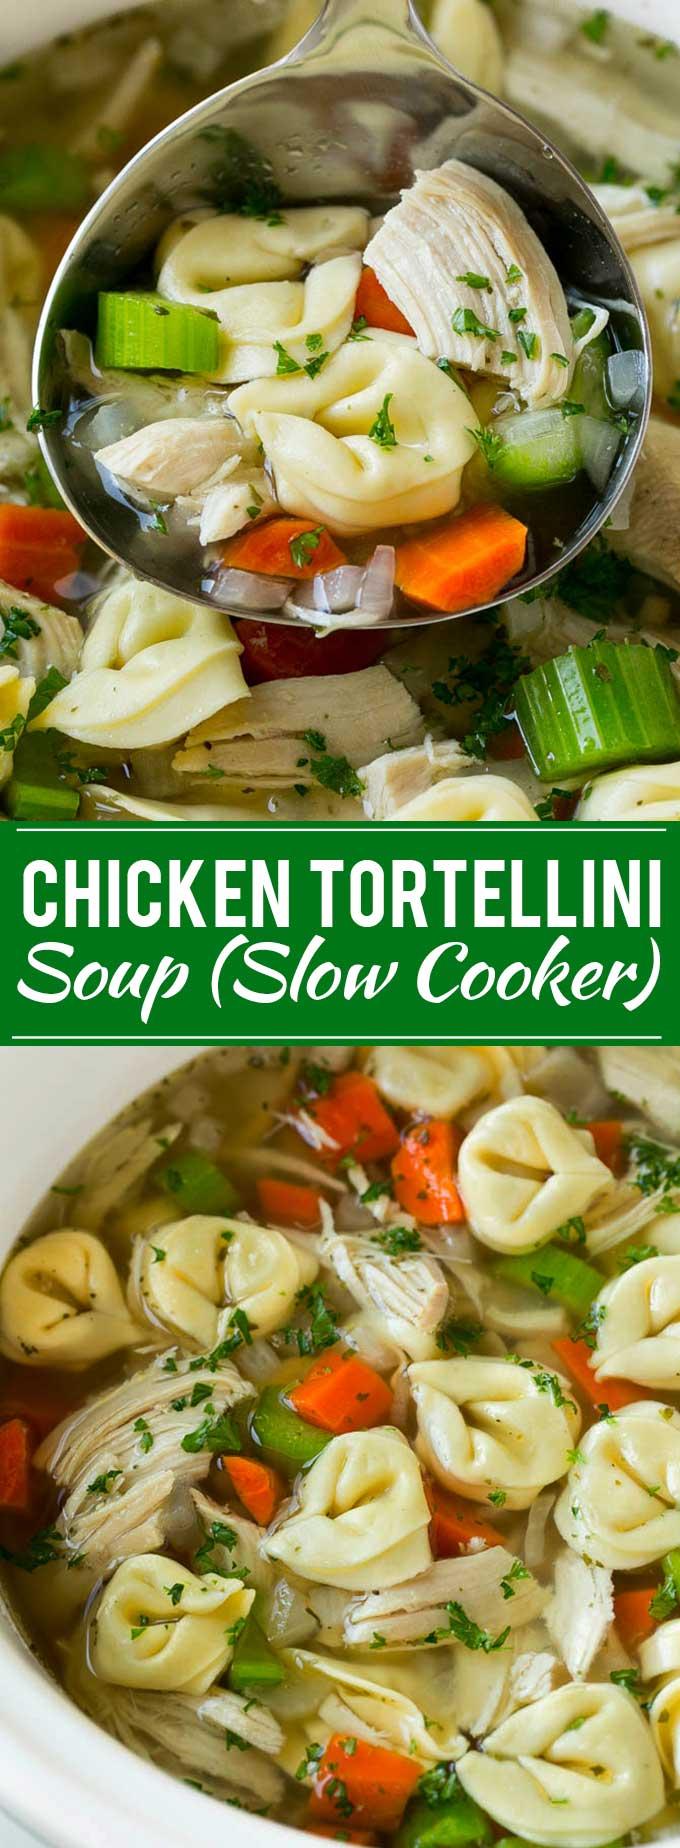 Chicken Tortellini Soup Recipe | Chicken Soup Recipe | Slow Cooker Chicken Soup